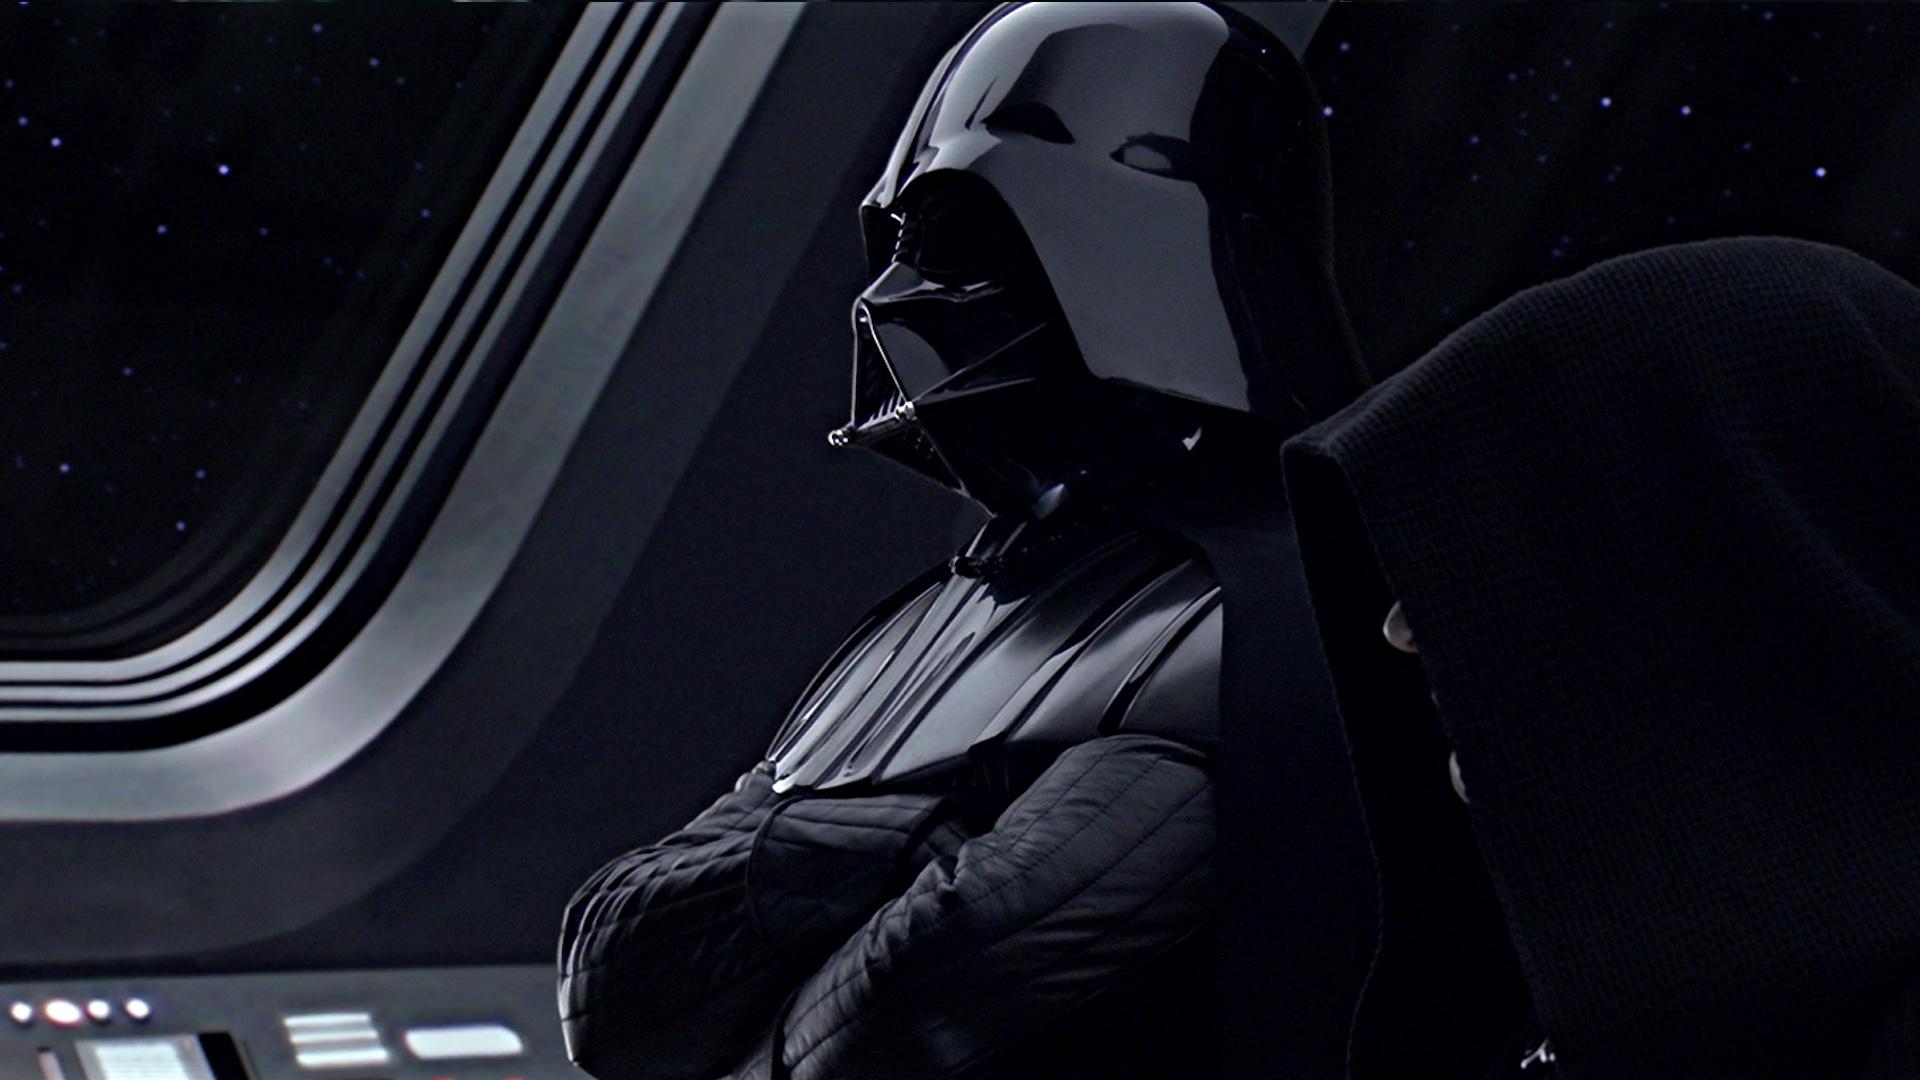 Some Star Wars Jedi: Fallen Order art leaked, and it's badass screenshot